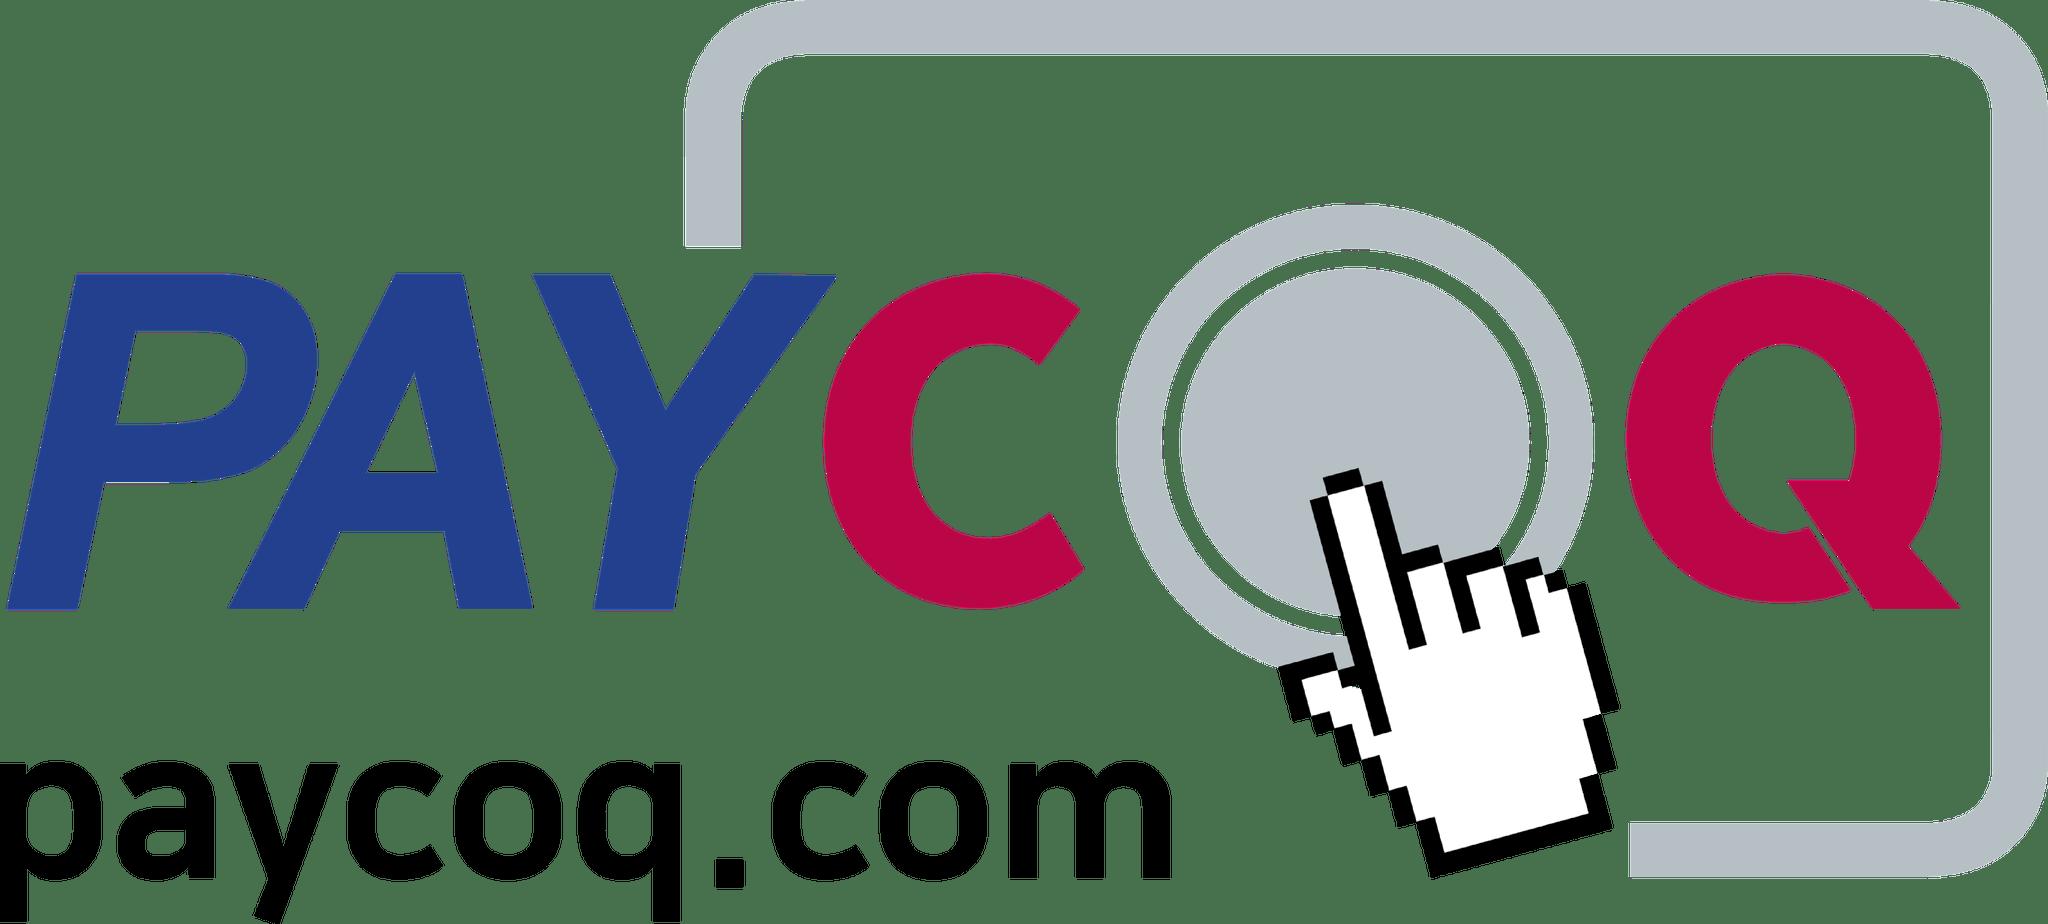 PAYCOQ Co., Ltd.